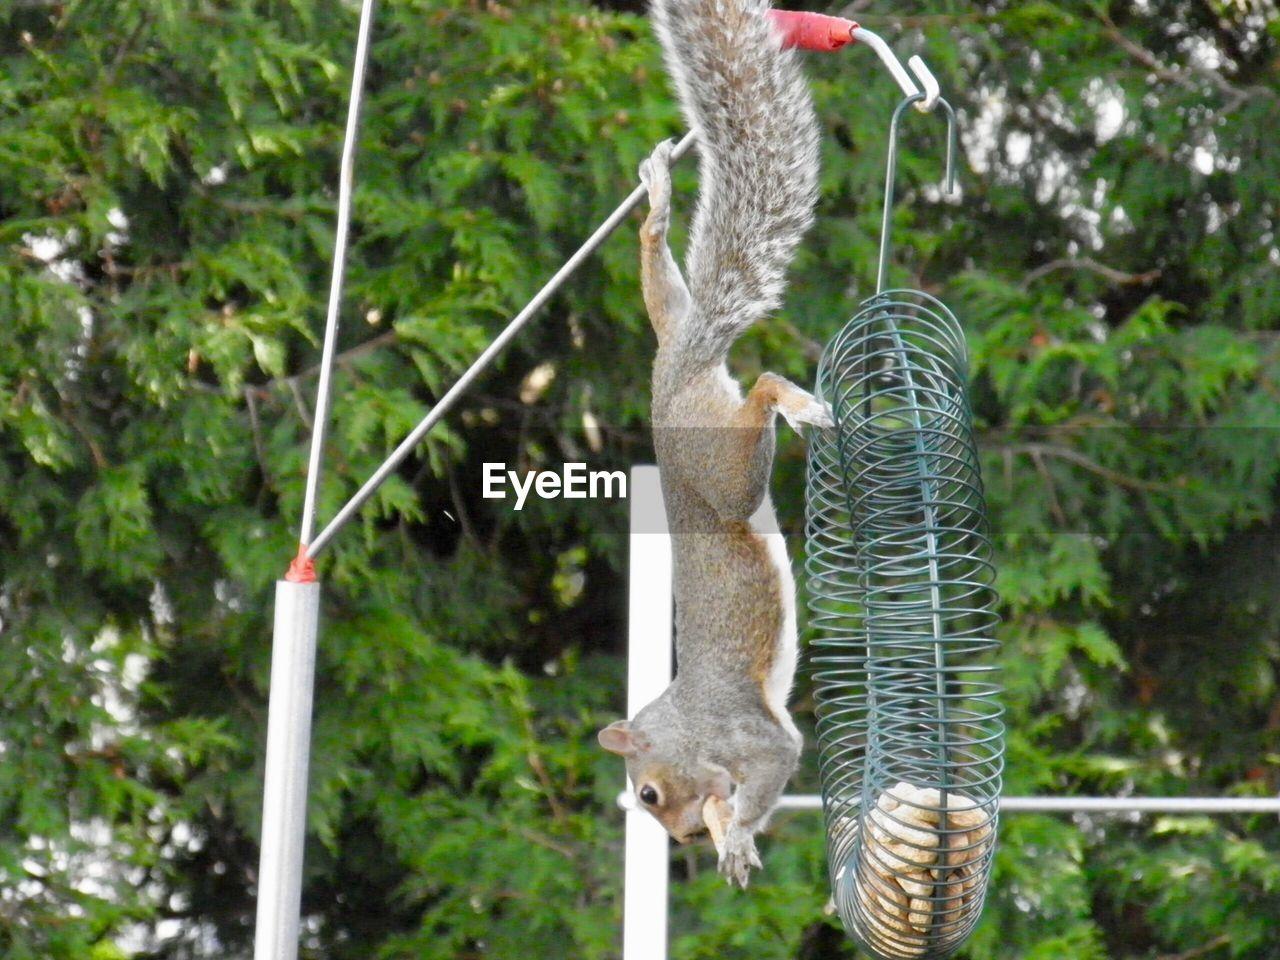 focus on foreground, animal themes, animal, hanging, day, nature, plant, no people, animal wildlife, vertebrate, one animal, tree, animals in the wild, rope, outdoors, close-up, bird feeder, bird, climbing